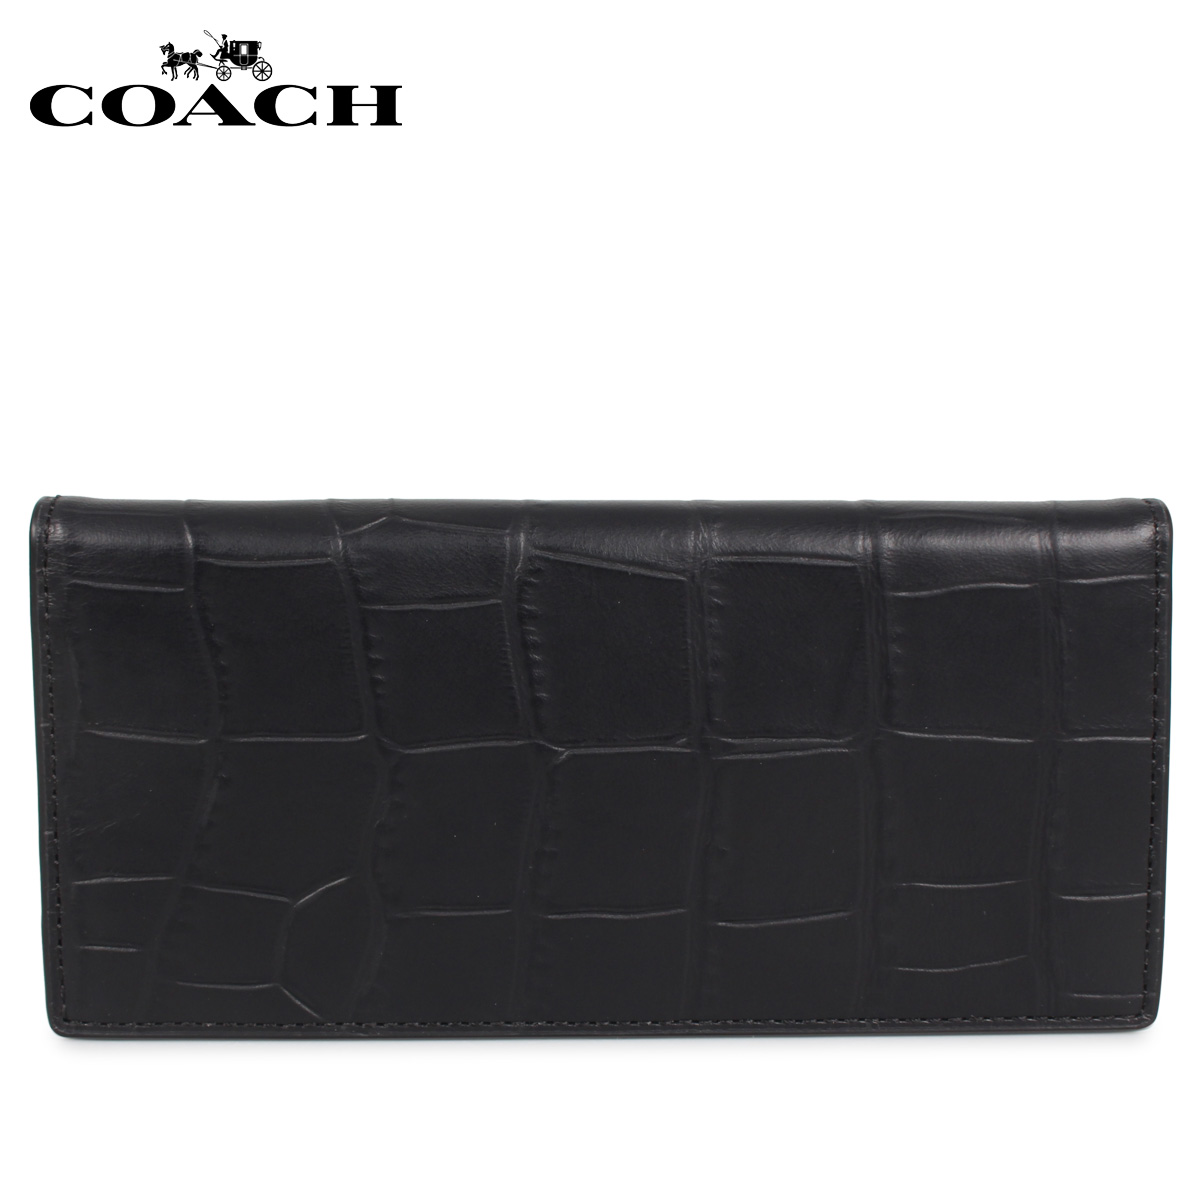 COACH コーチ 財布 長財布 メンズ レディース ブラック 黒 F73134 [3/10 新入荷]